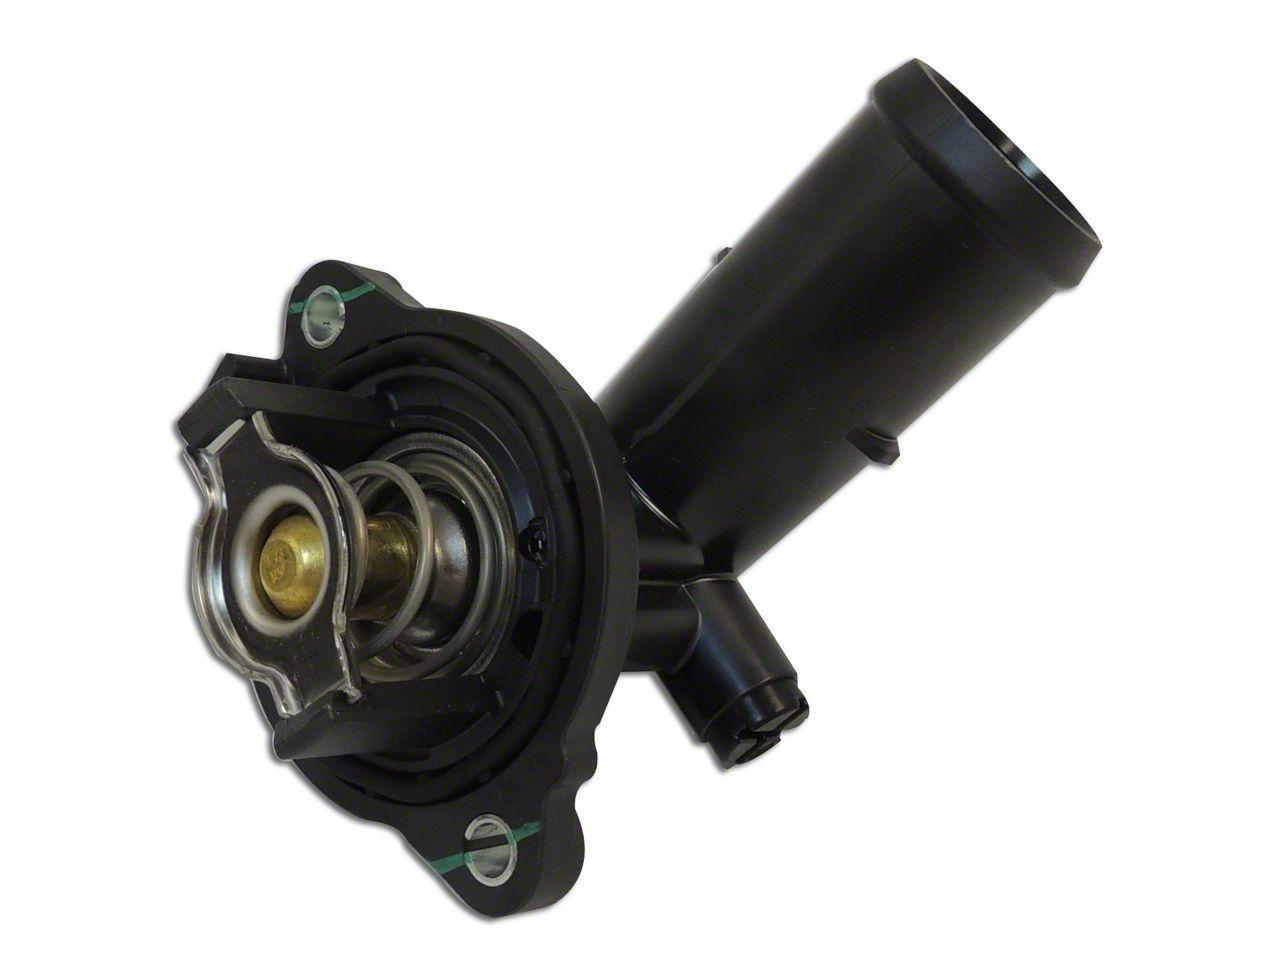 Thermostat & Housing - 203 Degree (12-18 3.6L Jeep Wrangler JK)